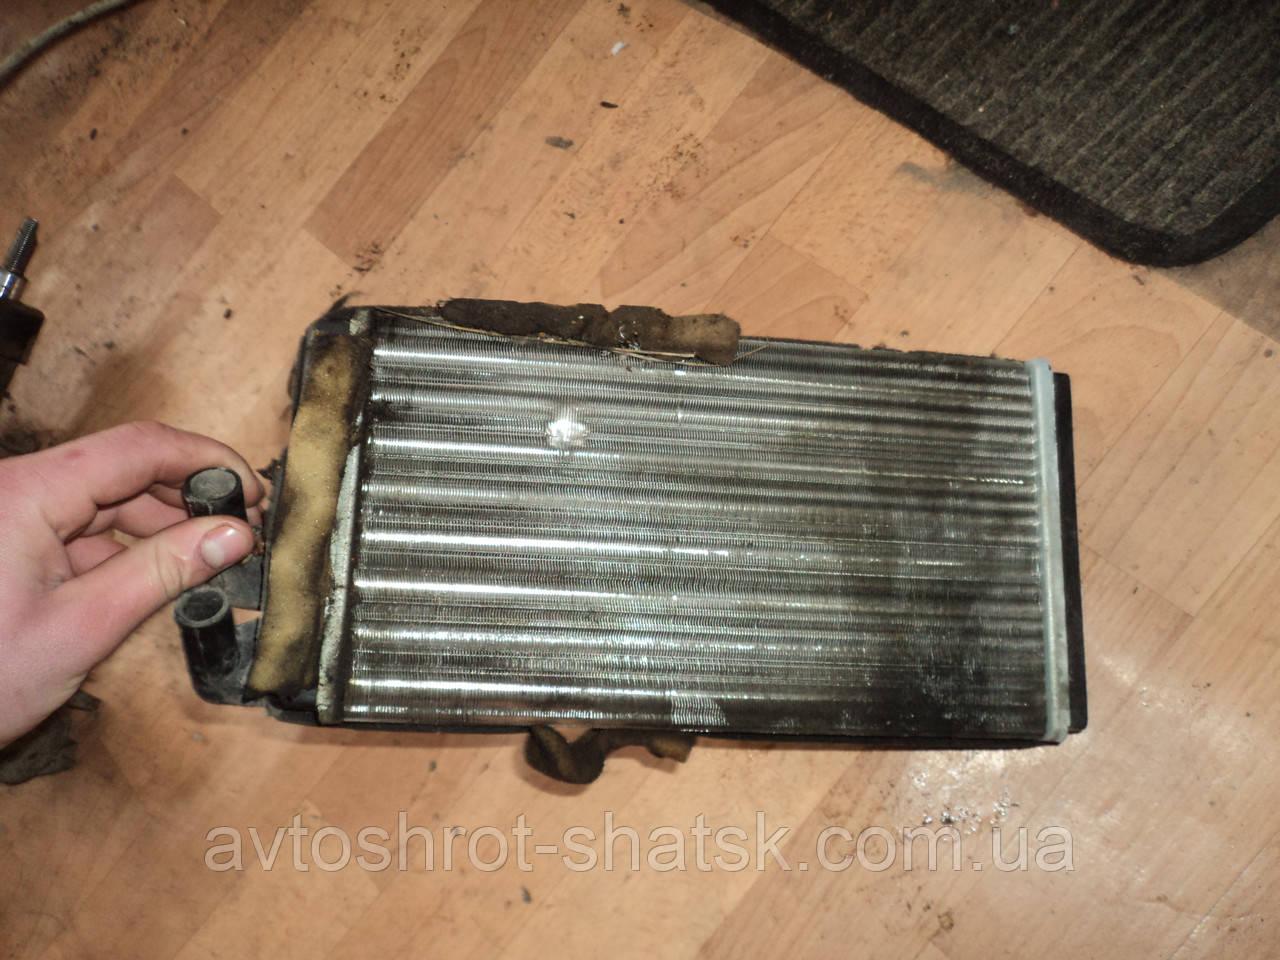 Радиатор печки ауди 100 с3